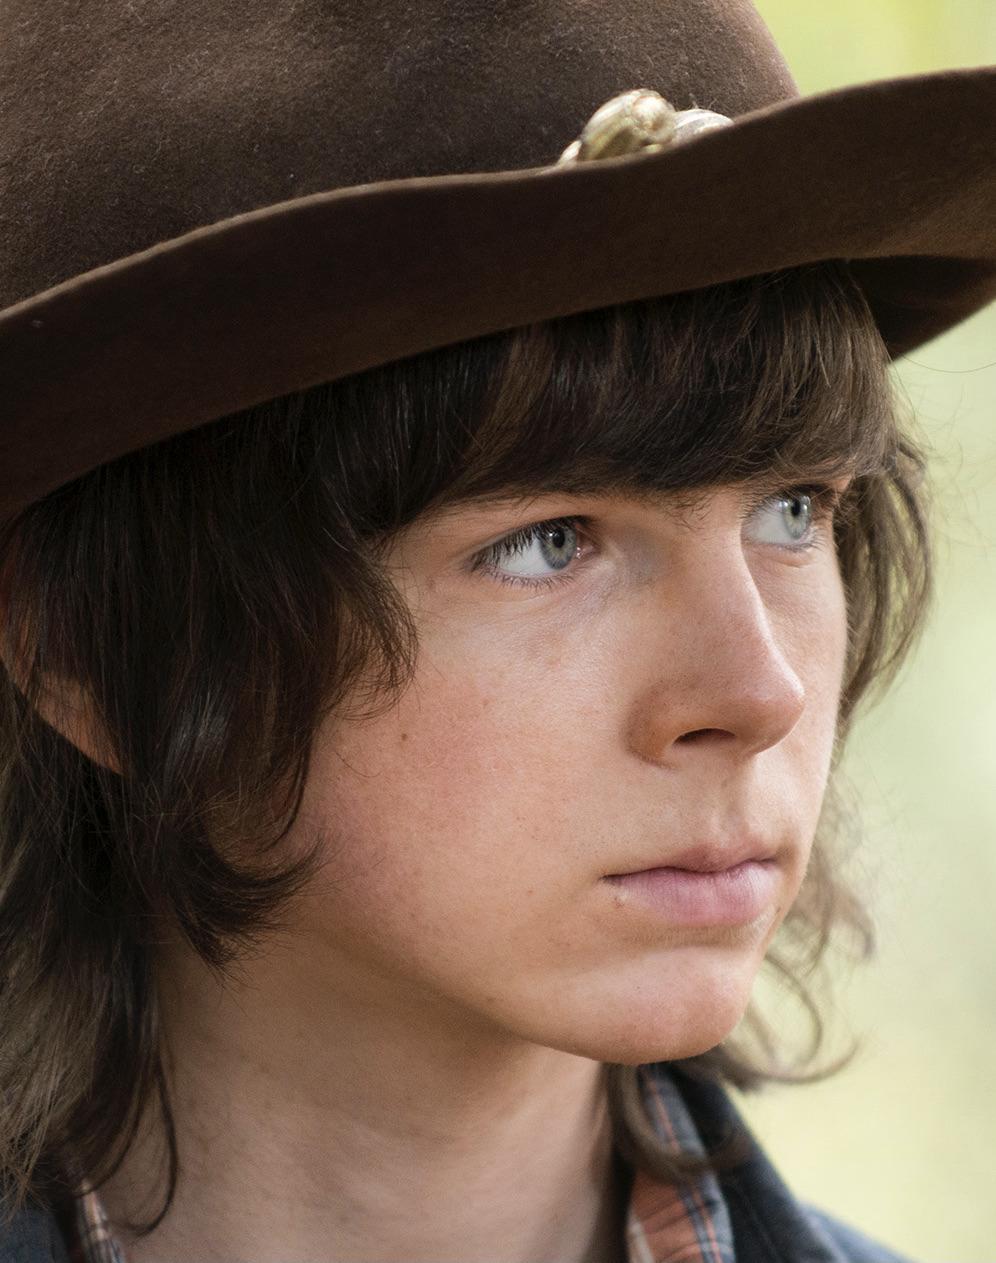 carl grimes the walking dead season 5 Car Tuning  Walking Dead Carl